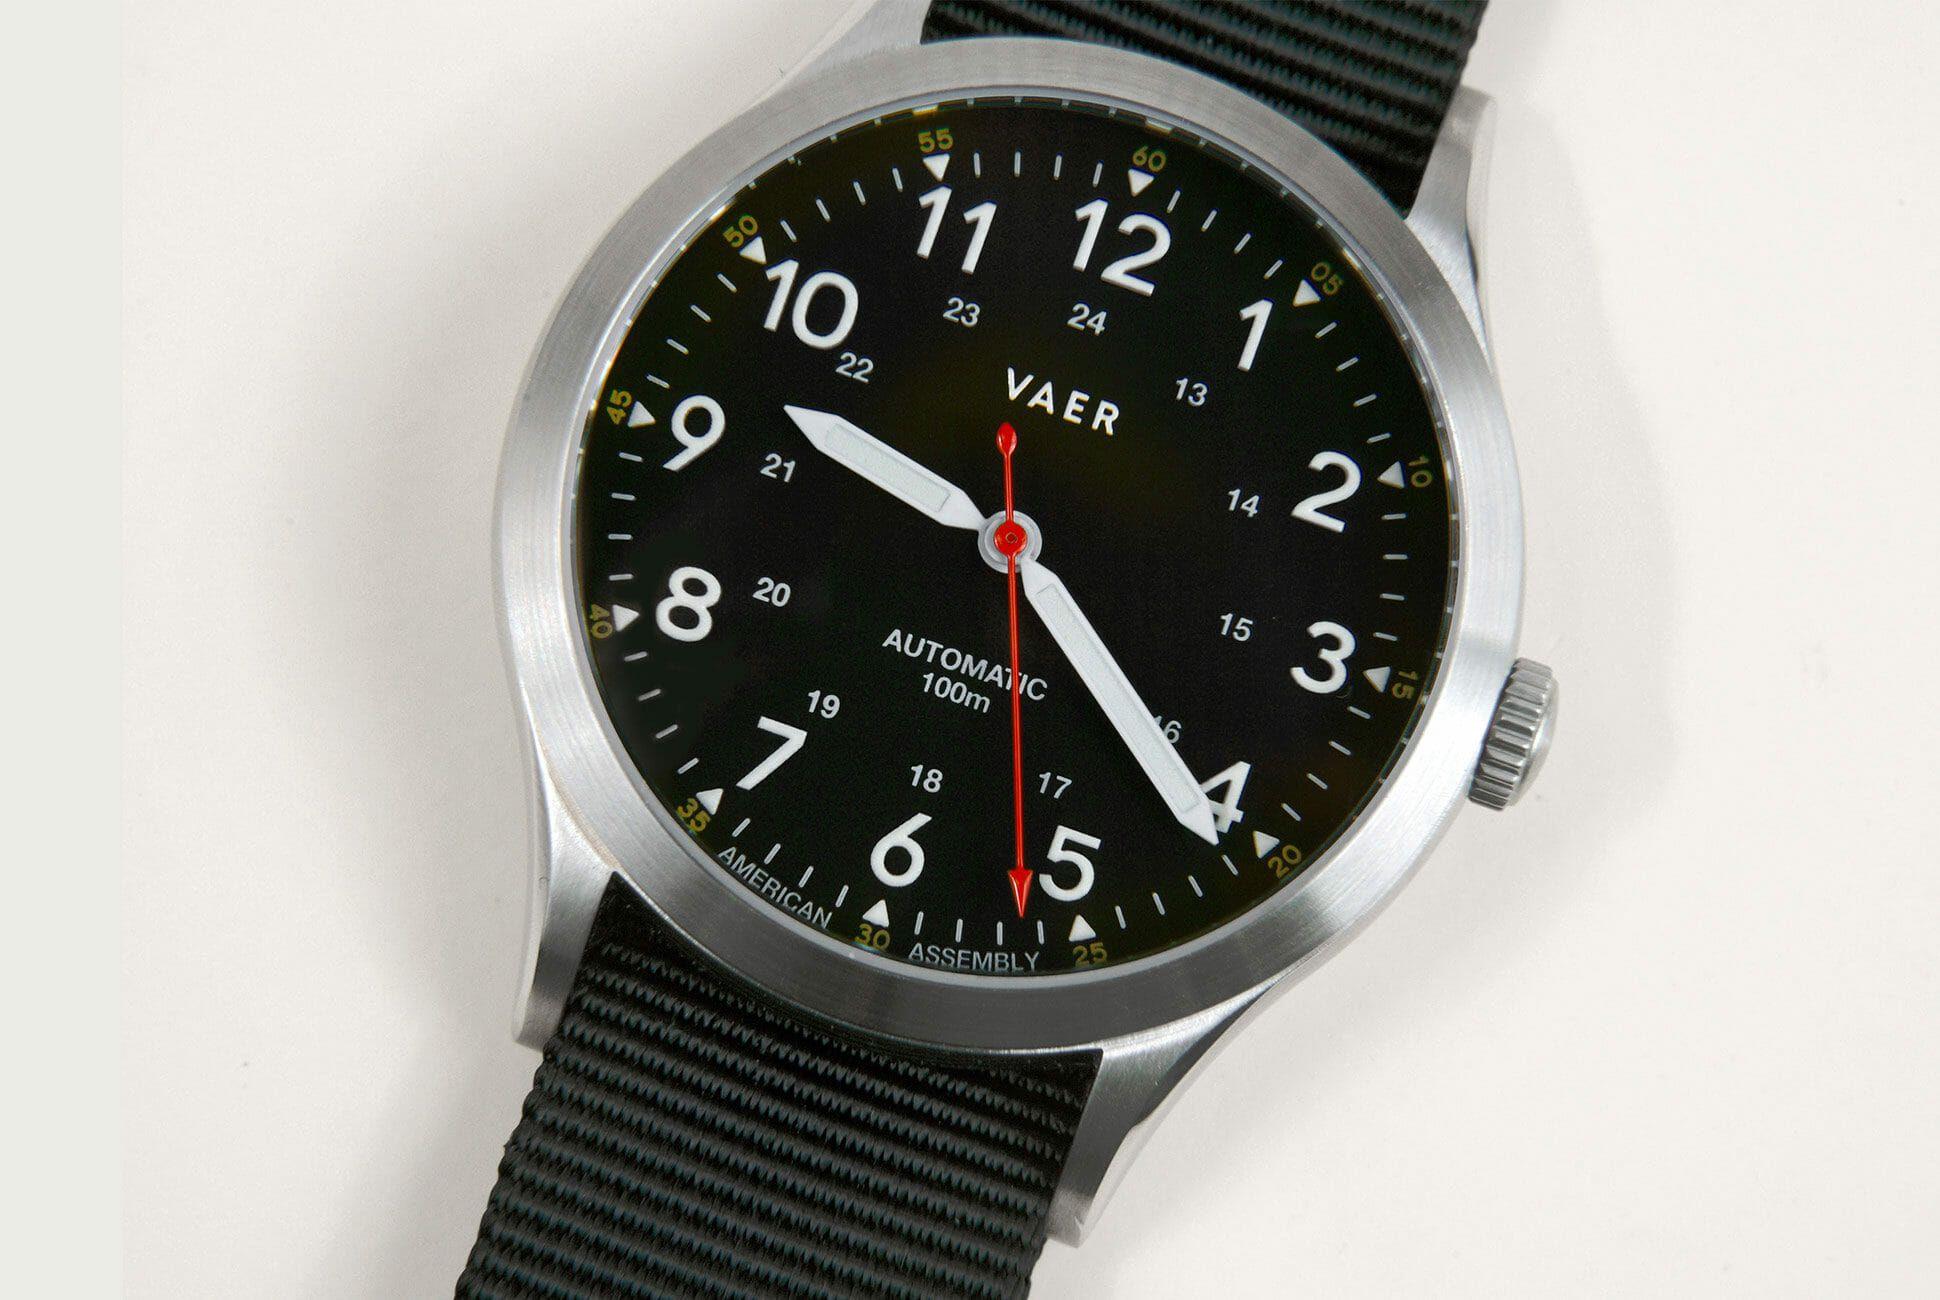 Vaer-Automatic-Field-Watches-gear-patrol-slide-3